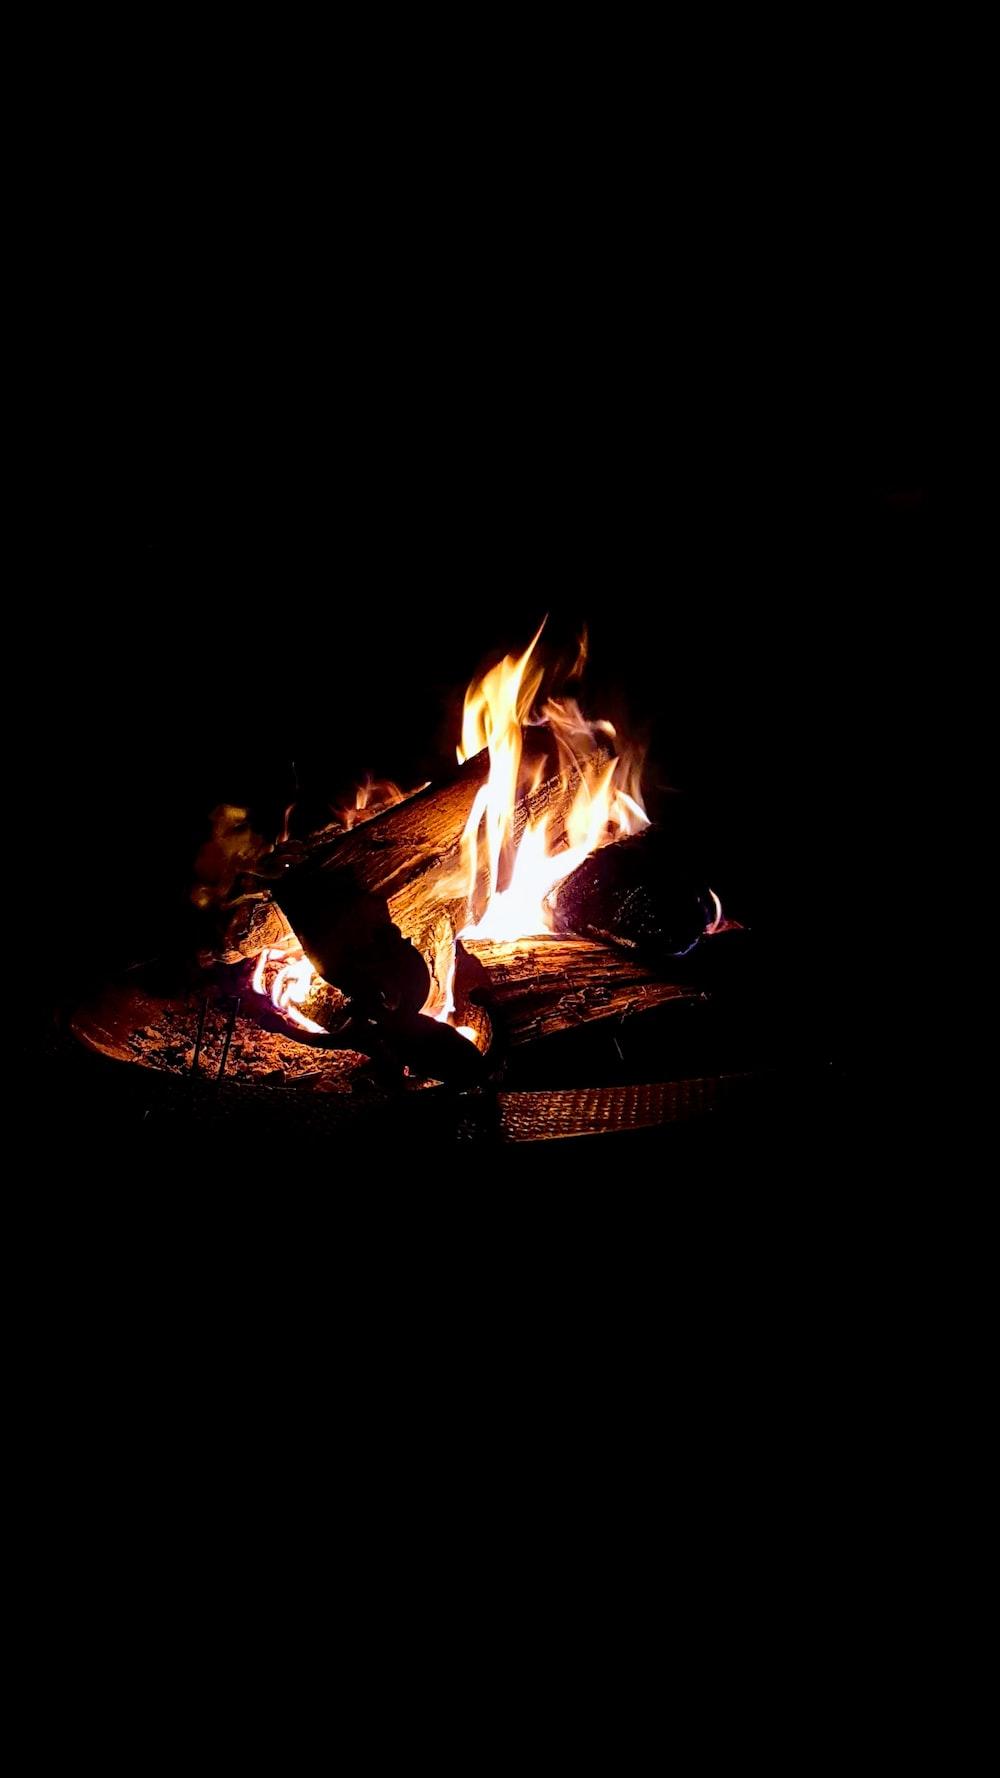 bonfire at nighttime